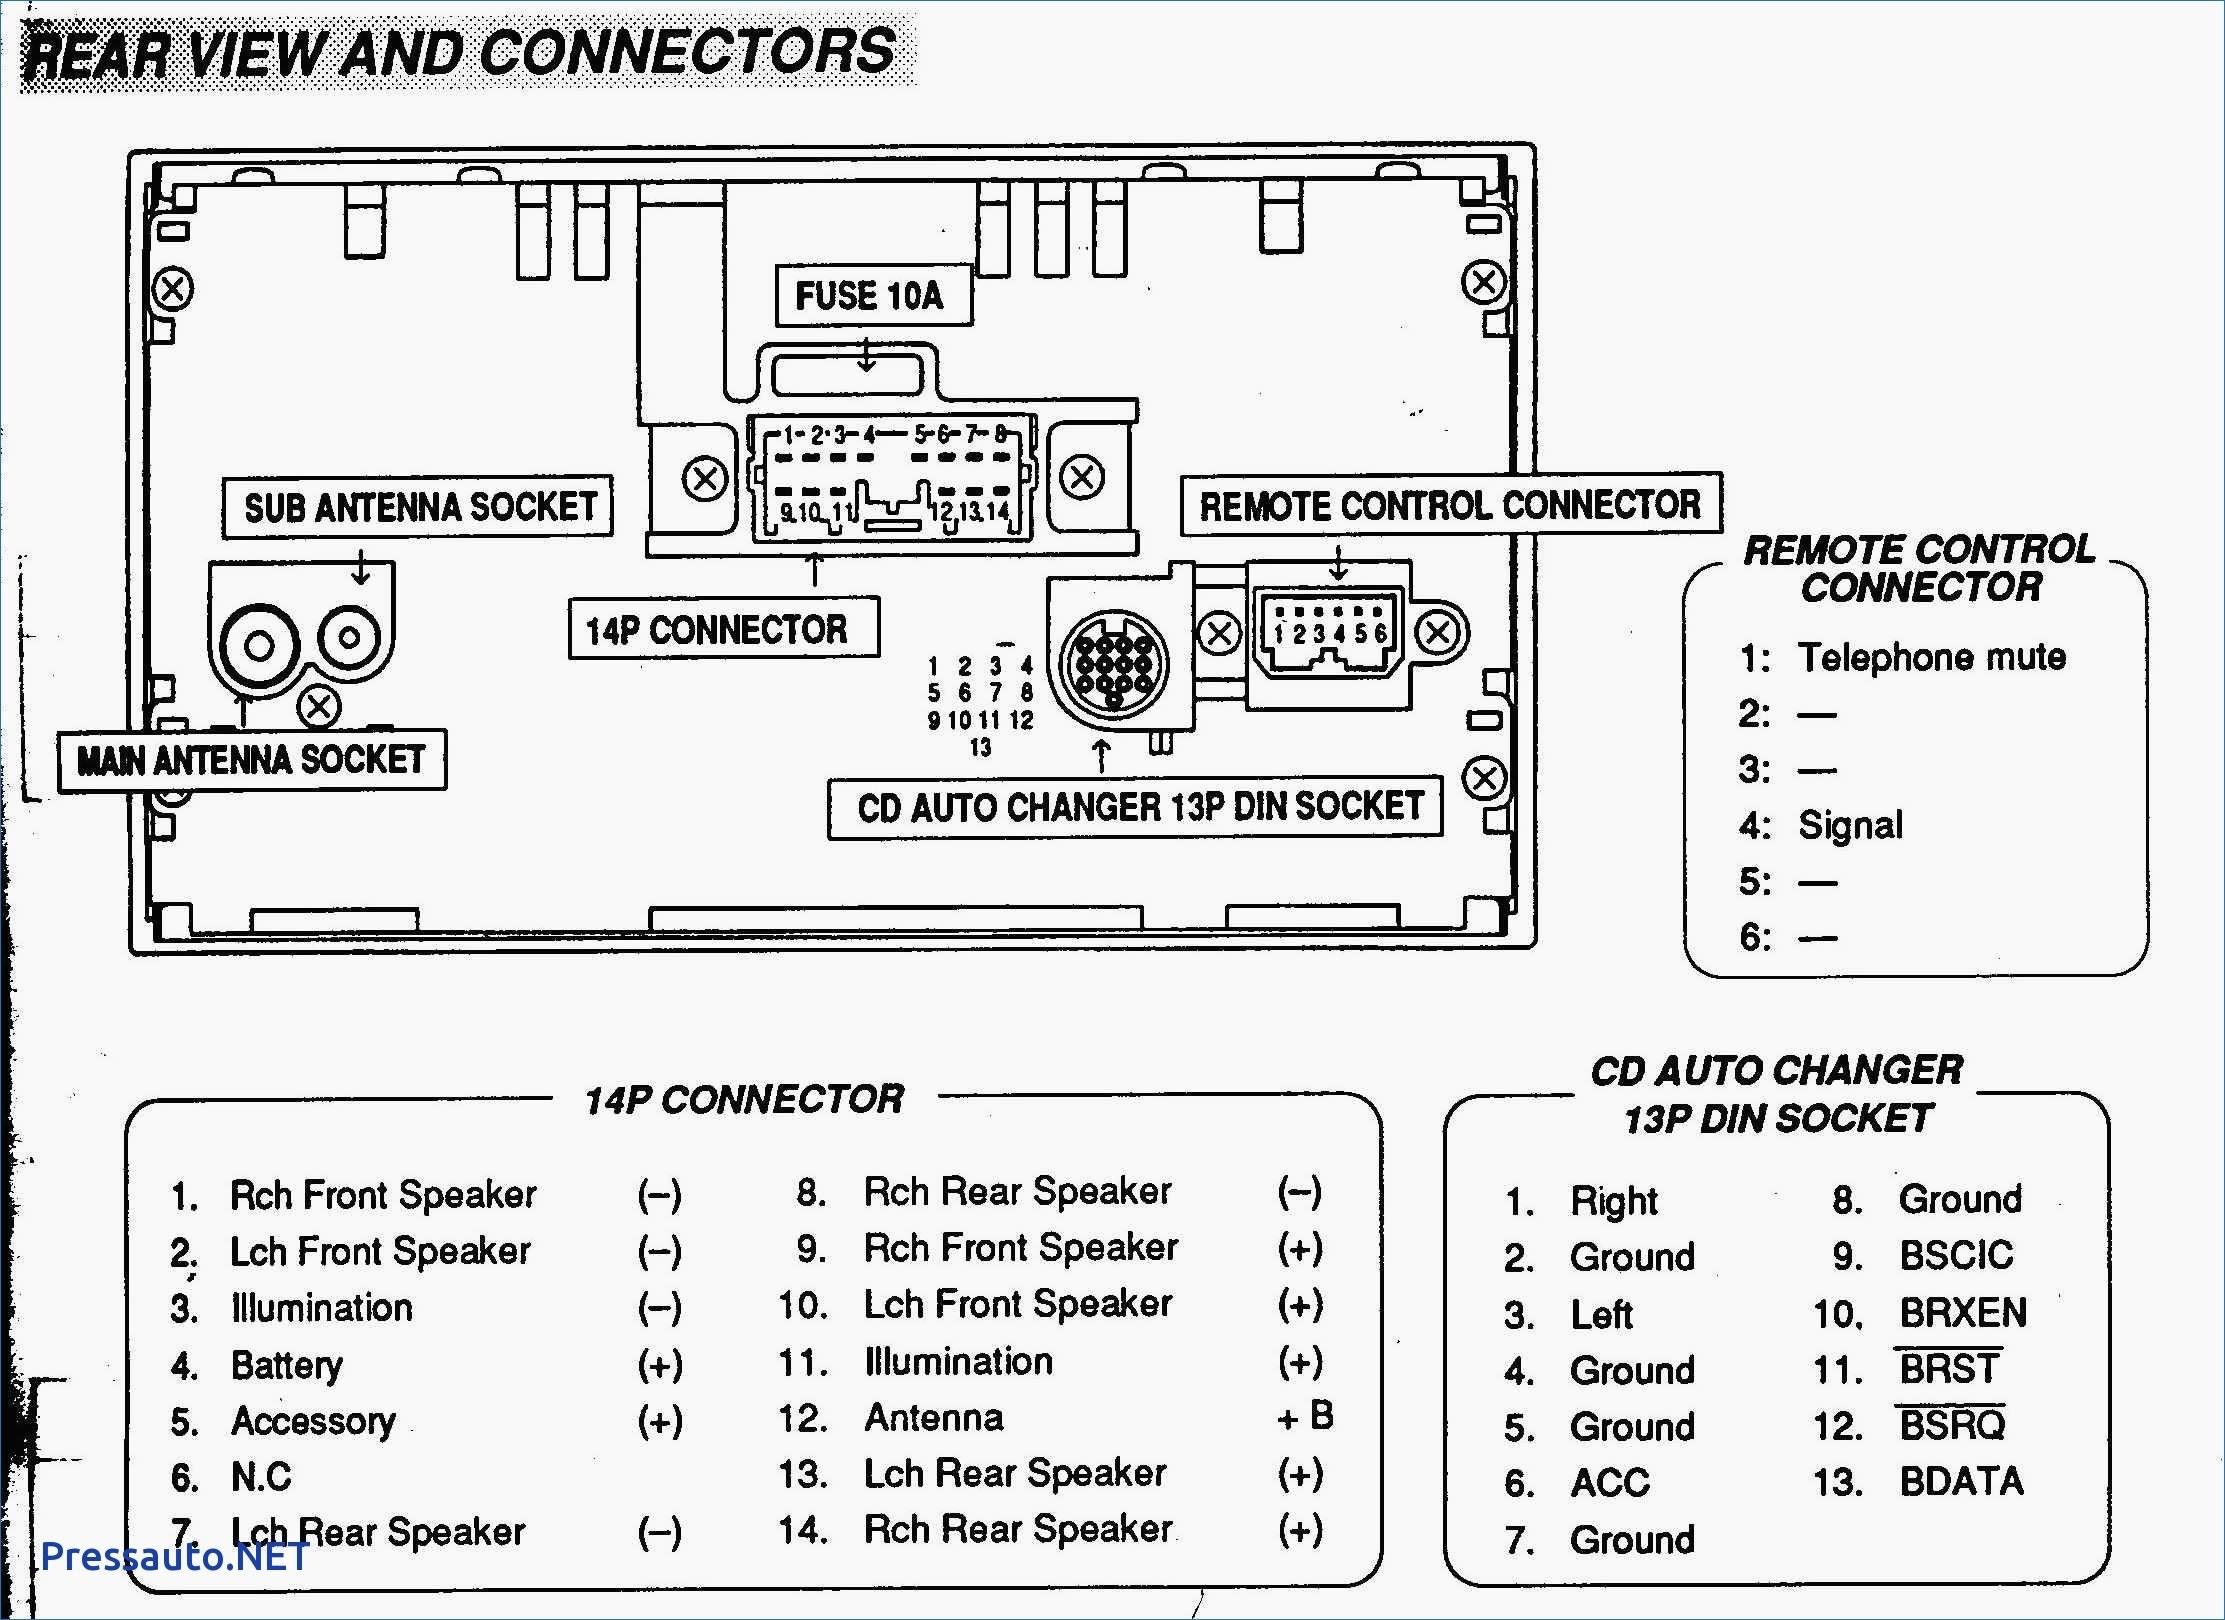 Wiring Diagram for Car Audio System Car Stereo Wiring Diagram Bmw ...